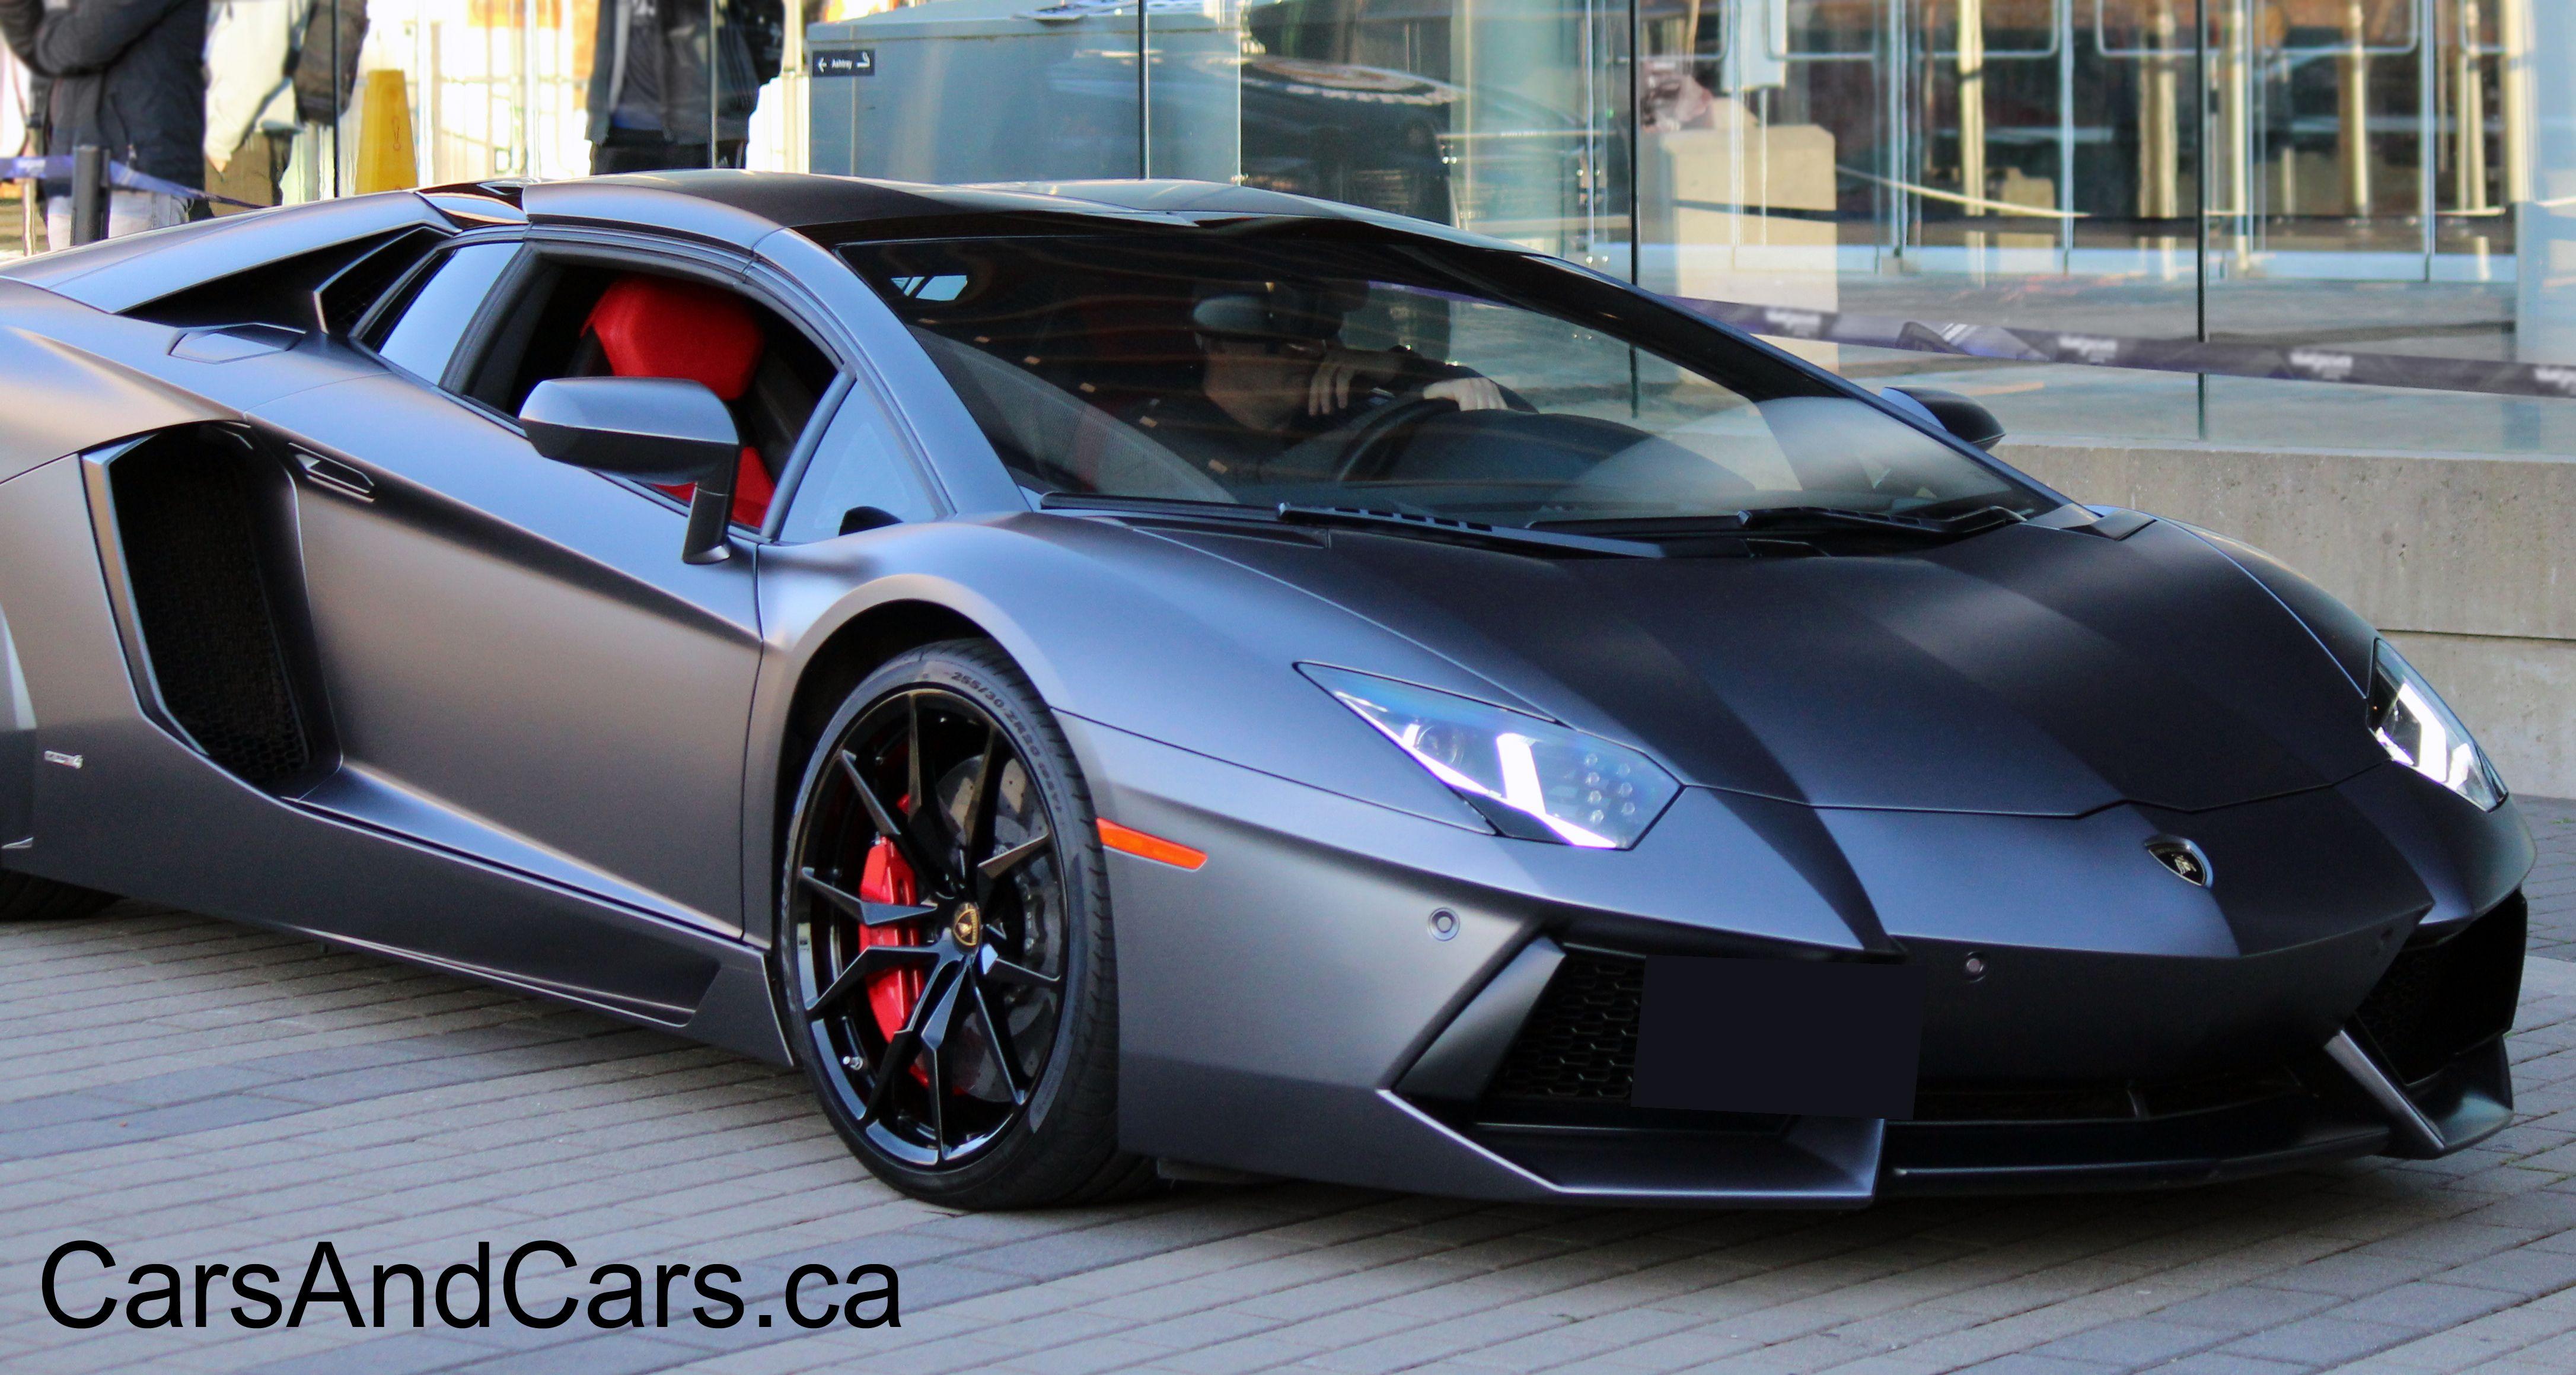 Lamborghini Aventador Lp700 4 Supercar Sportcar Luxury Canada